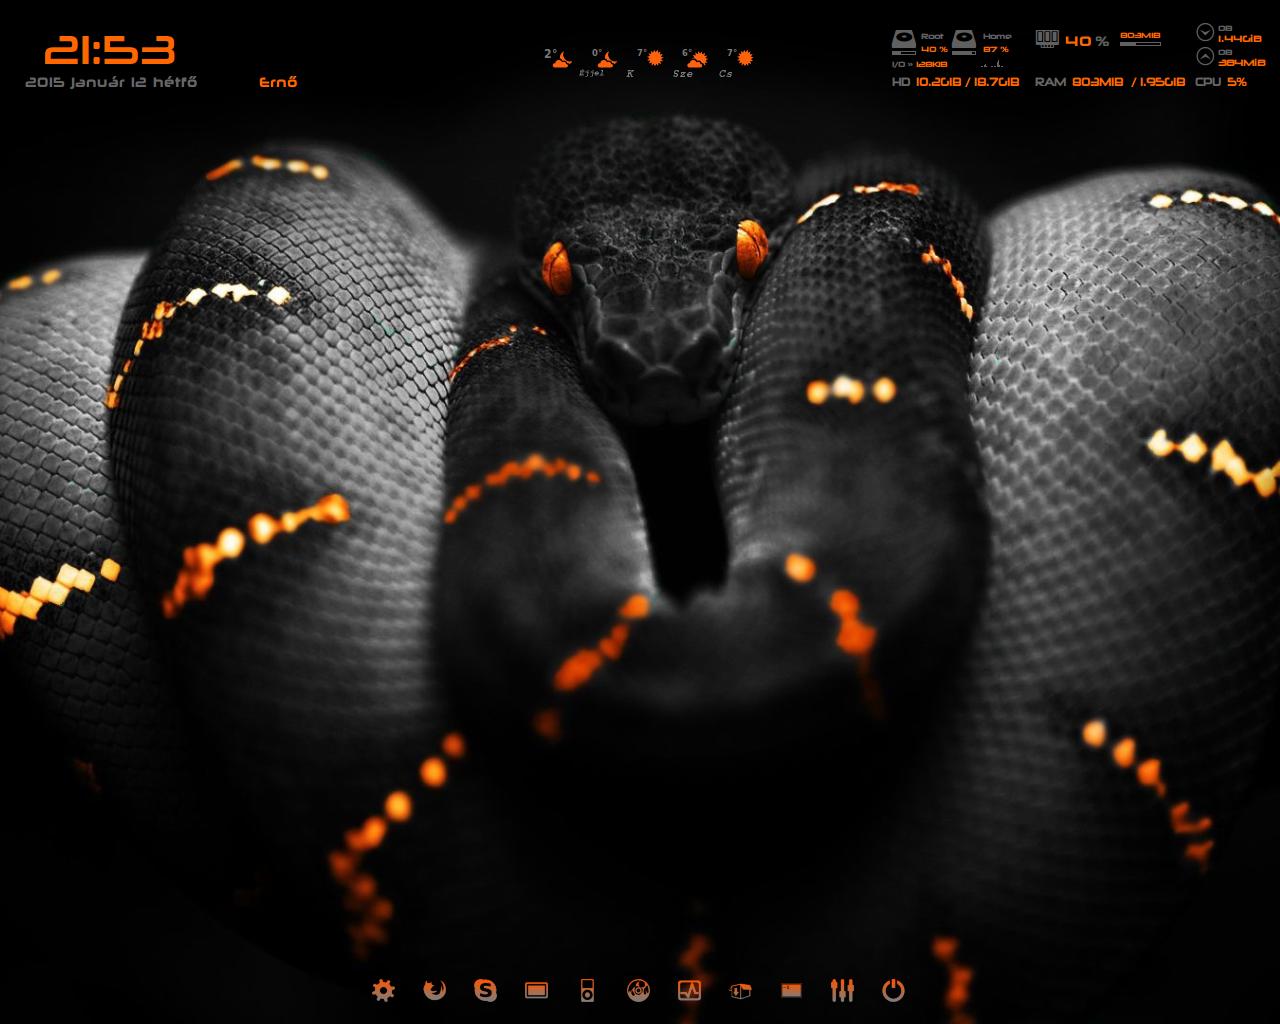 fc05.deviantart.net/fs71/f/2015/012/3/c/snake_attack_by_lathronos-d8dmz1u.png